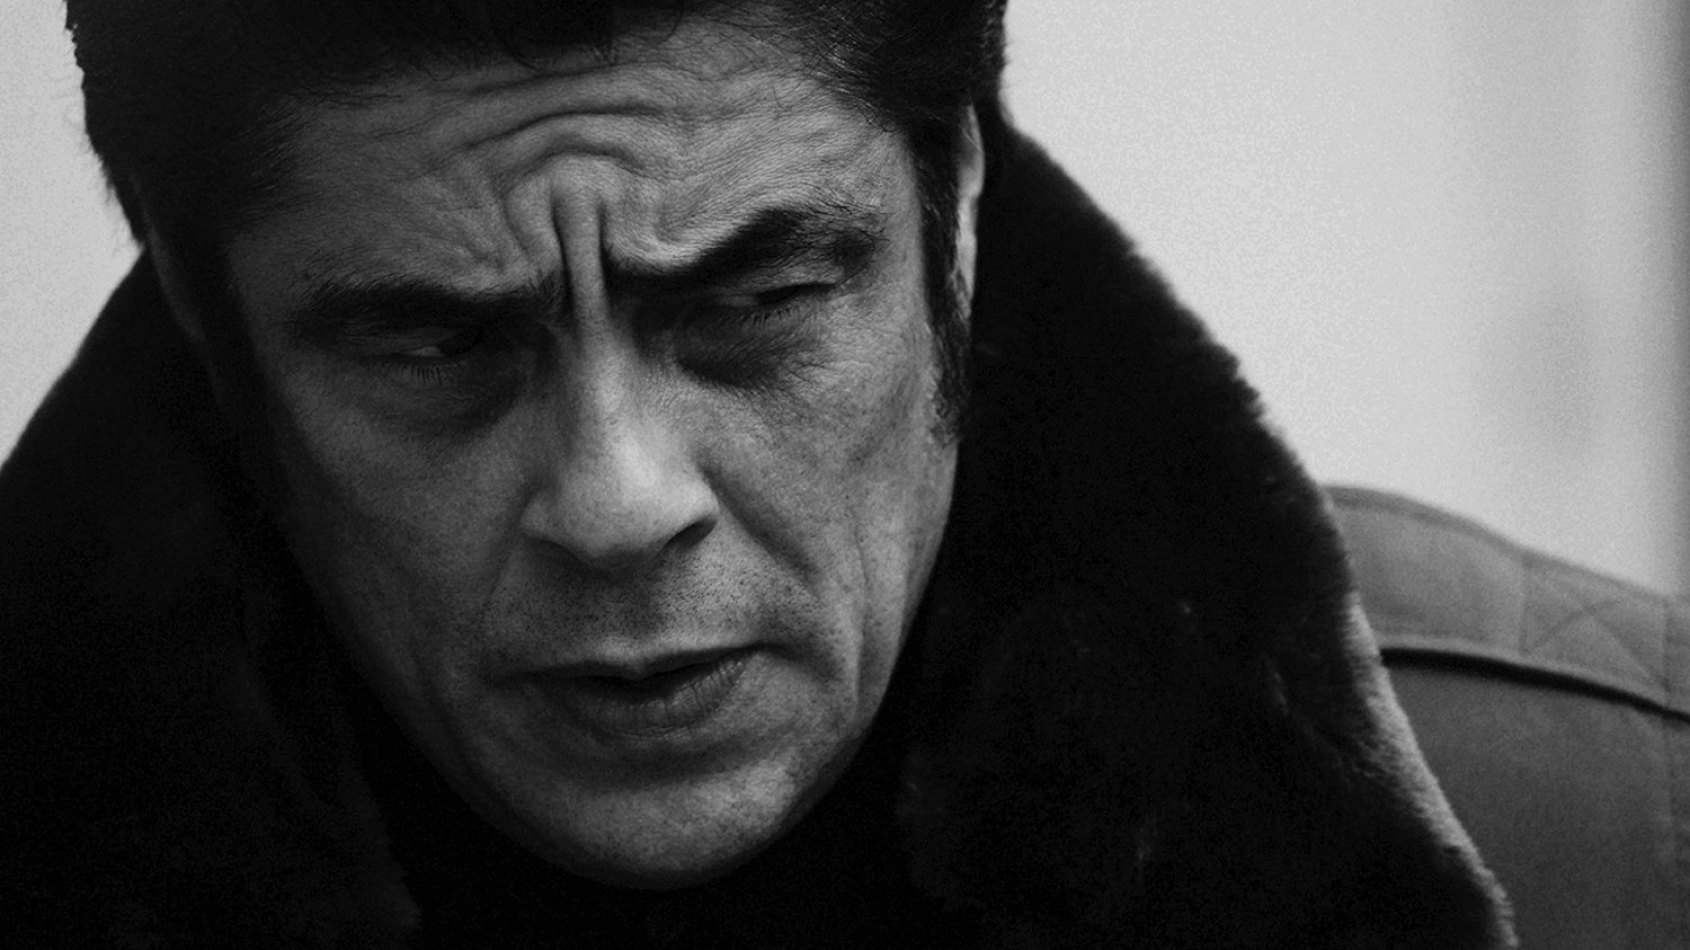 Benicio Del Toro parle de son personnage dans l'Episode VIII